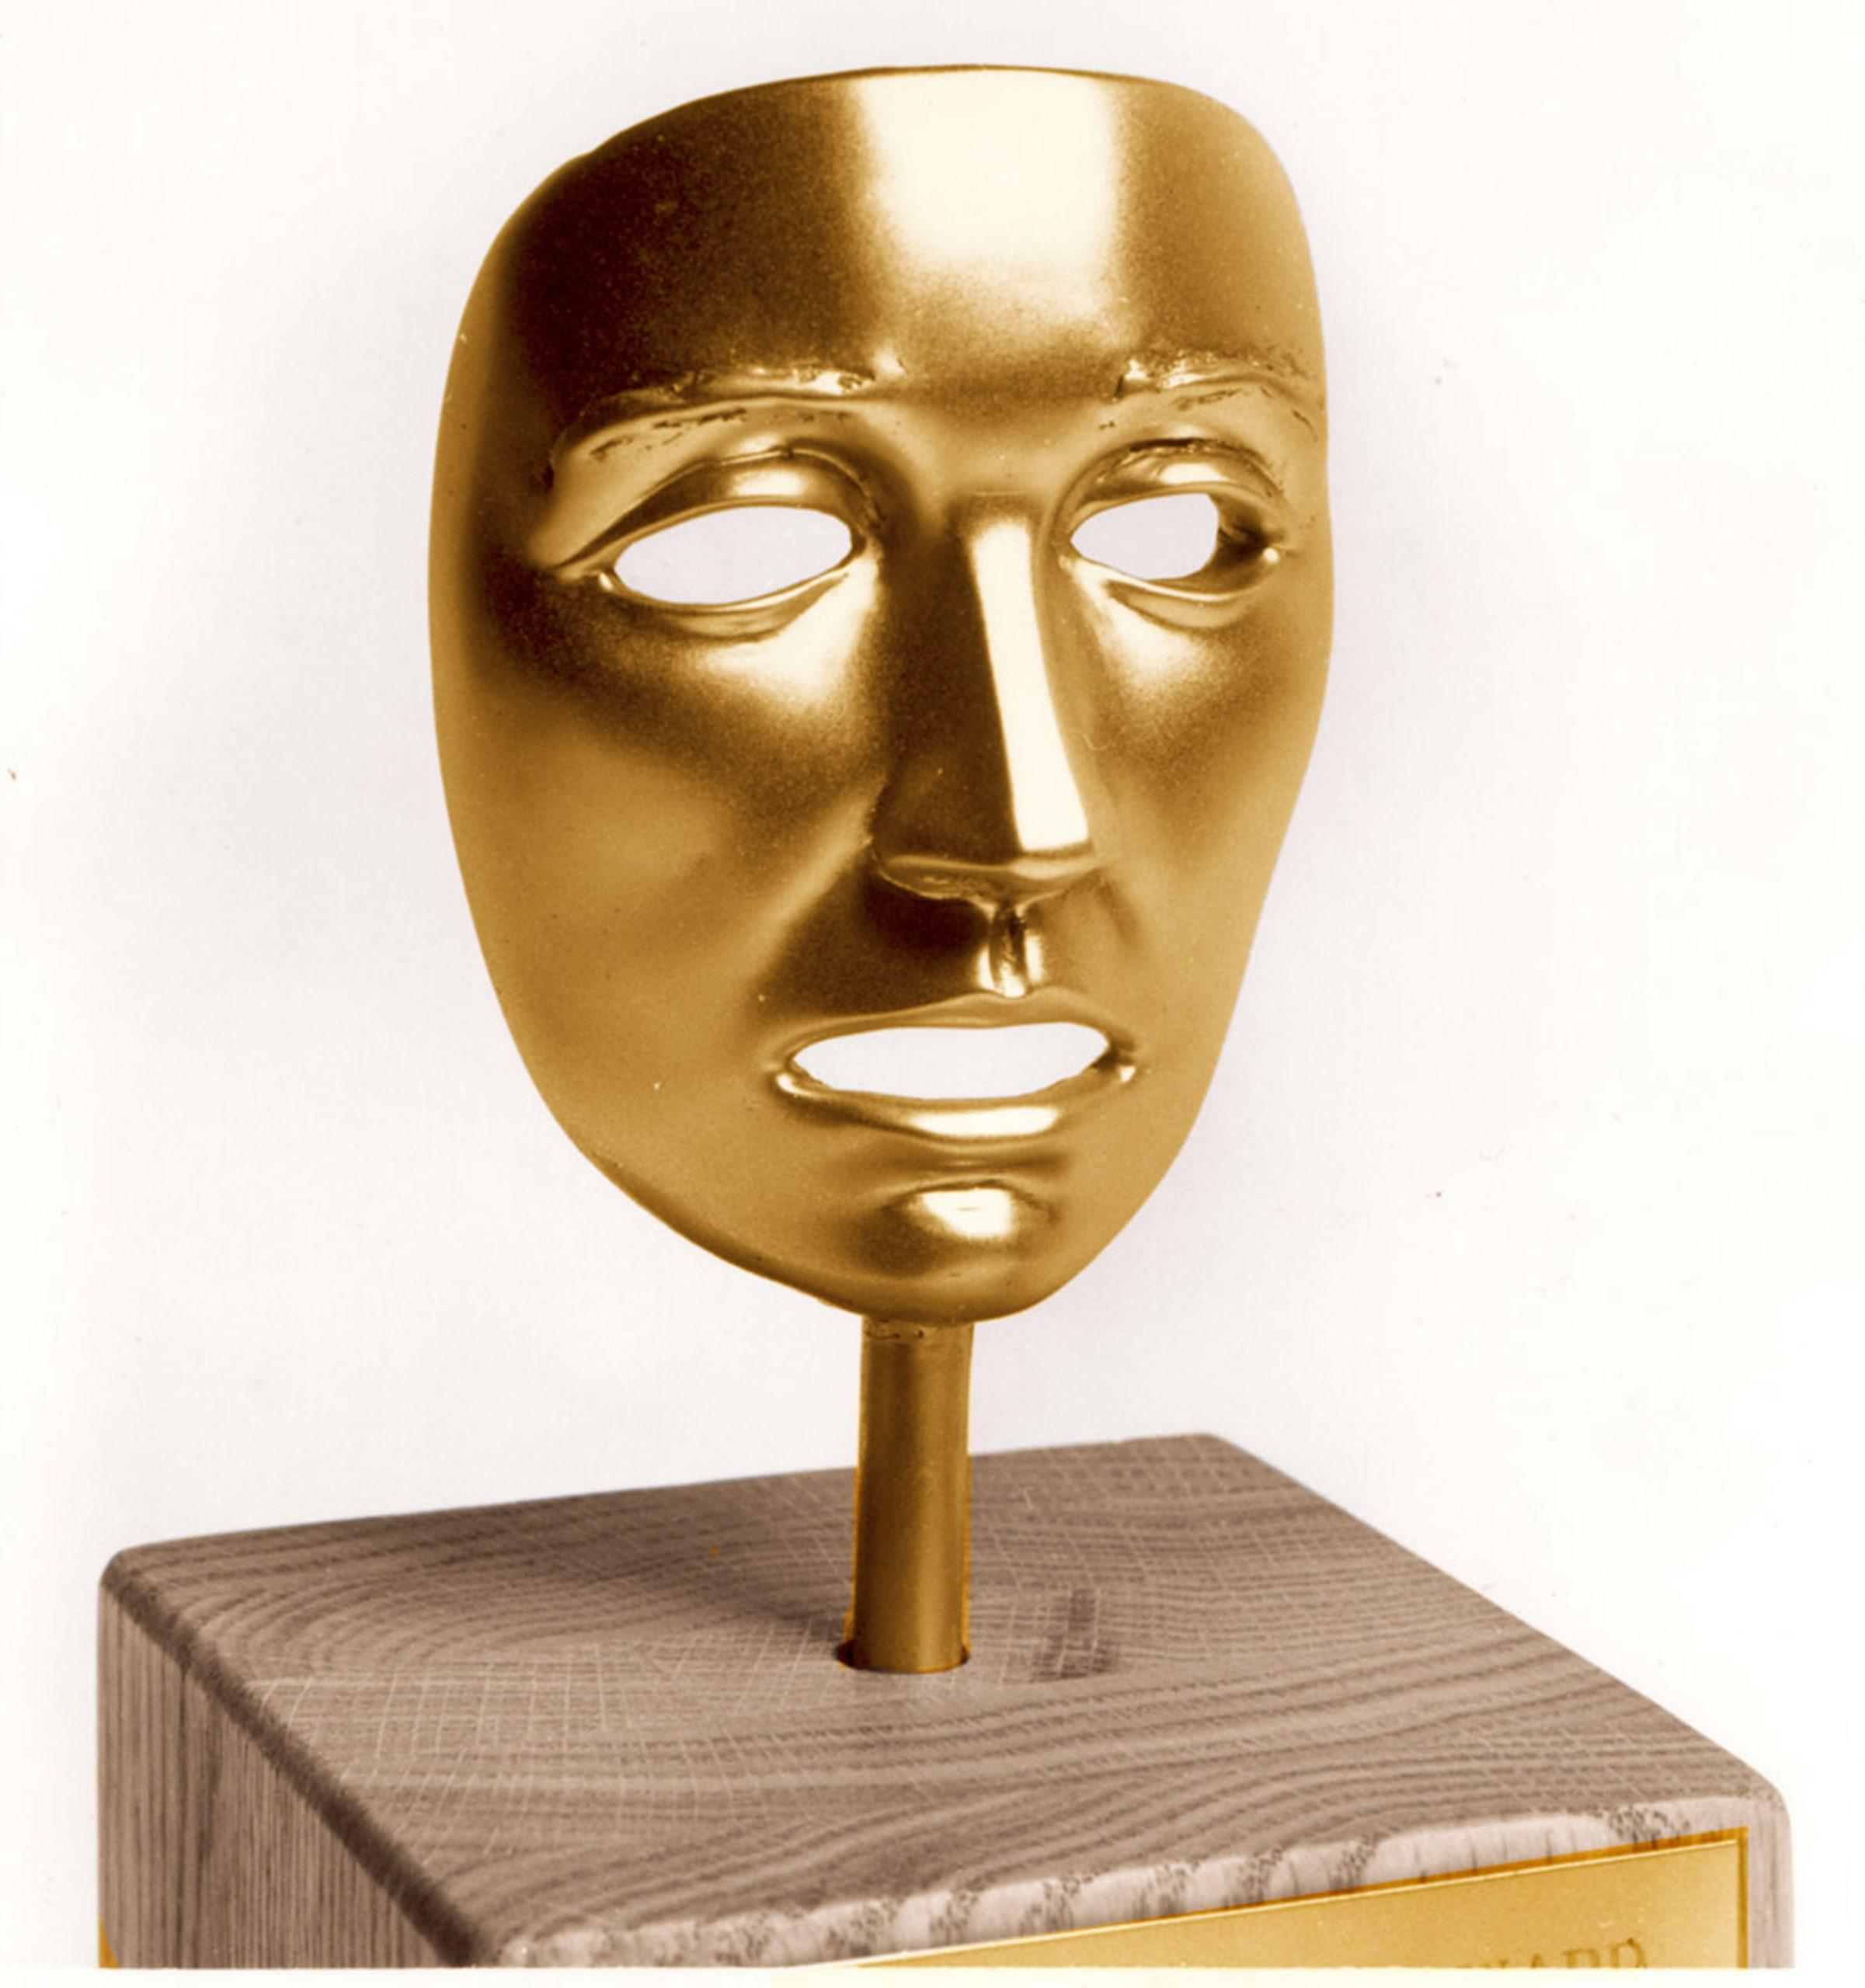 Douglas Randall The Actors Studio Dusa Award